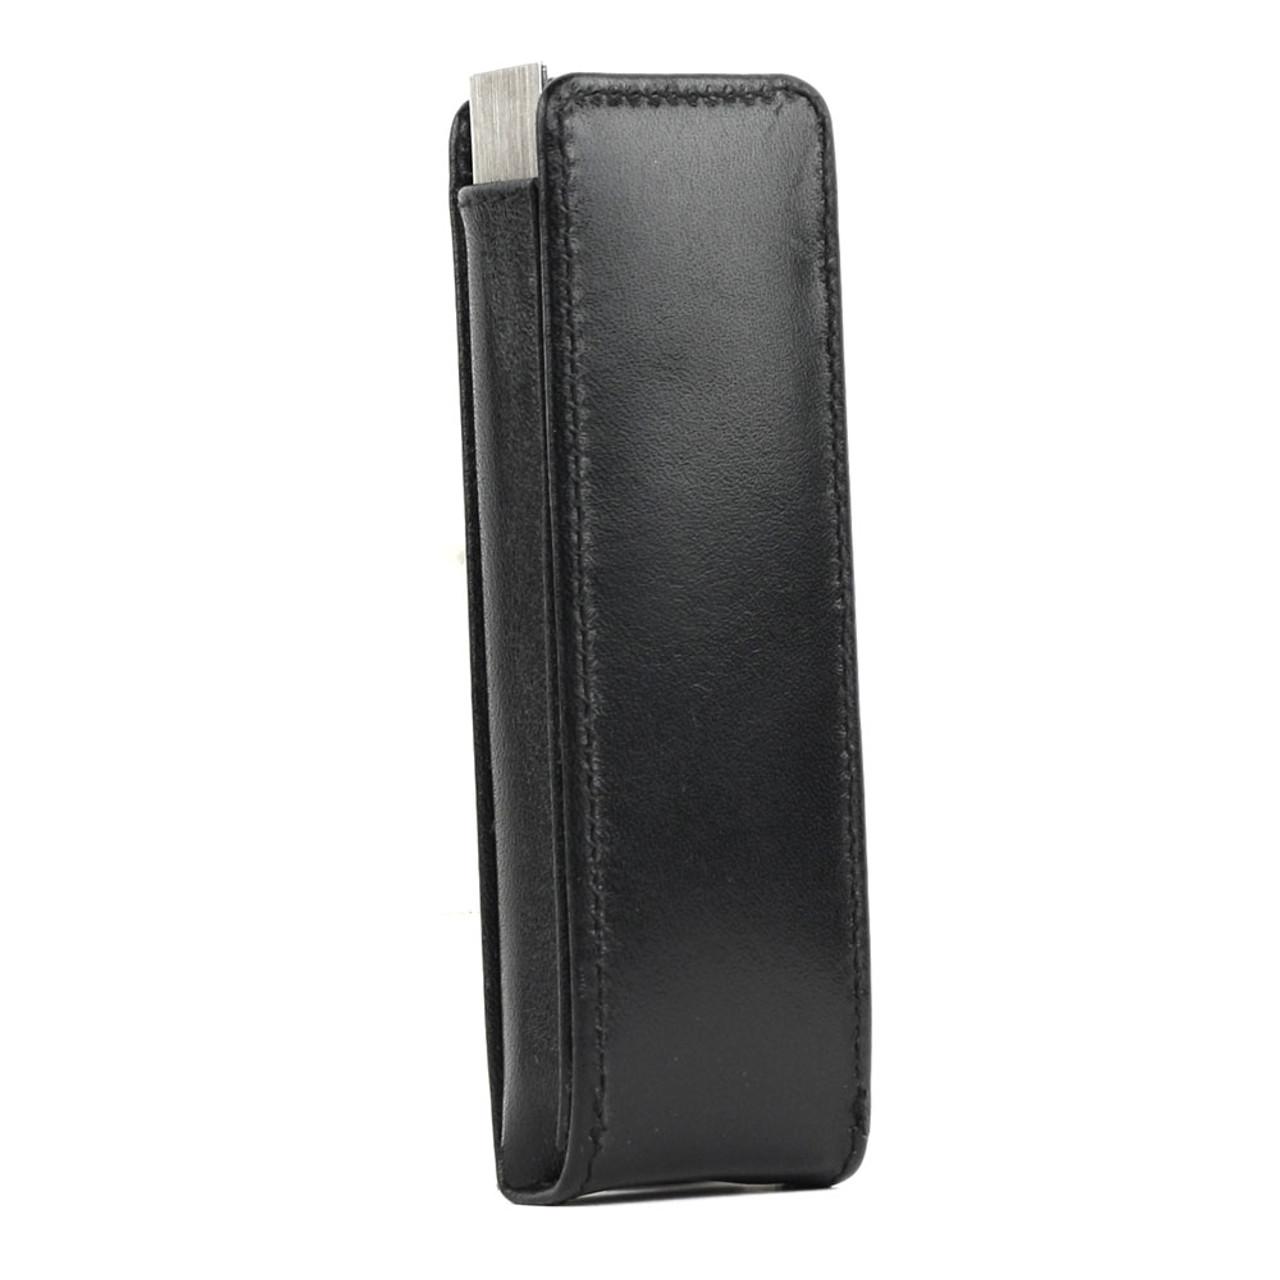 Springfield Micro Compact Magazine Pocket Protector